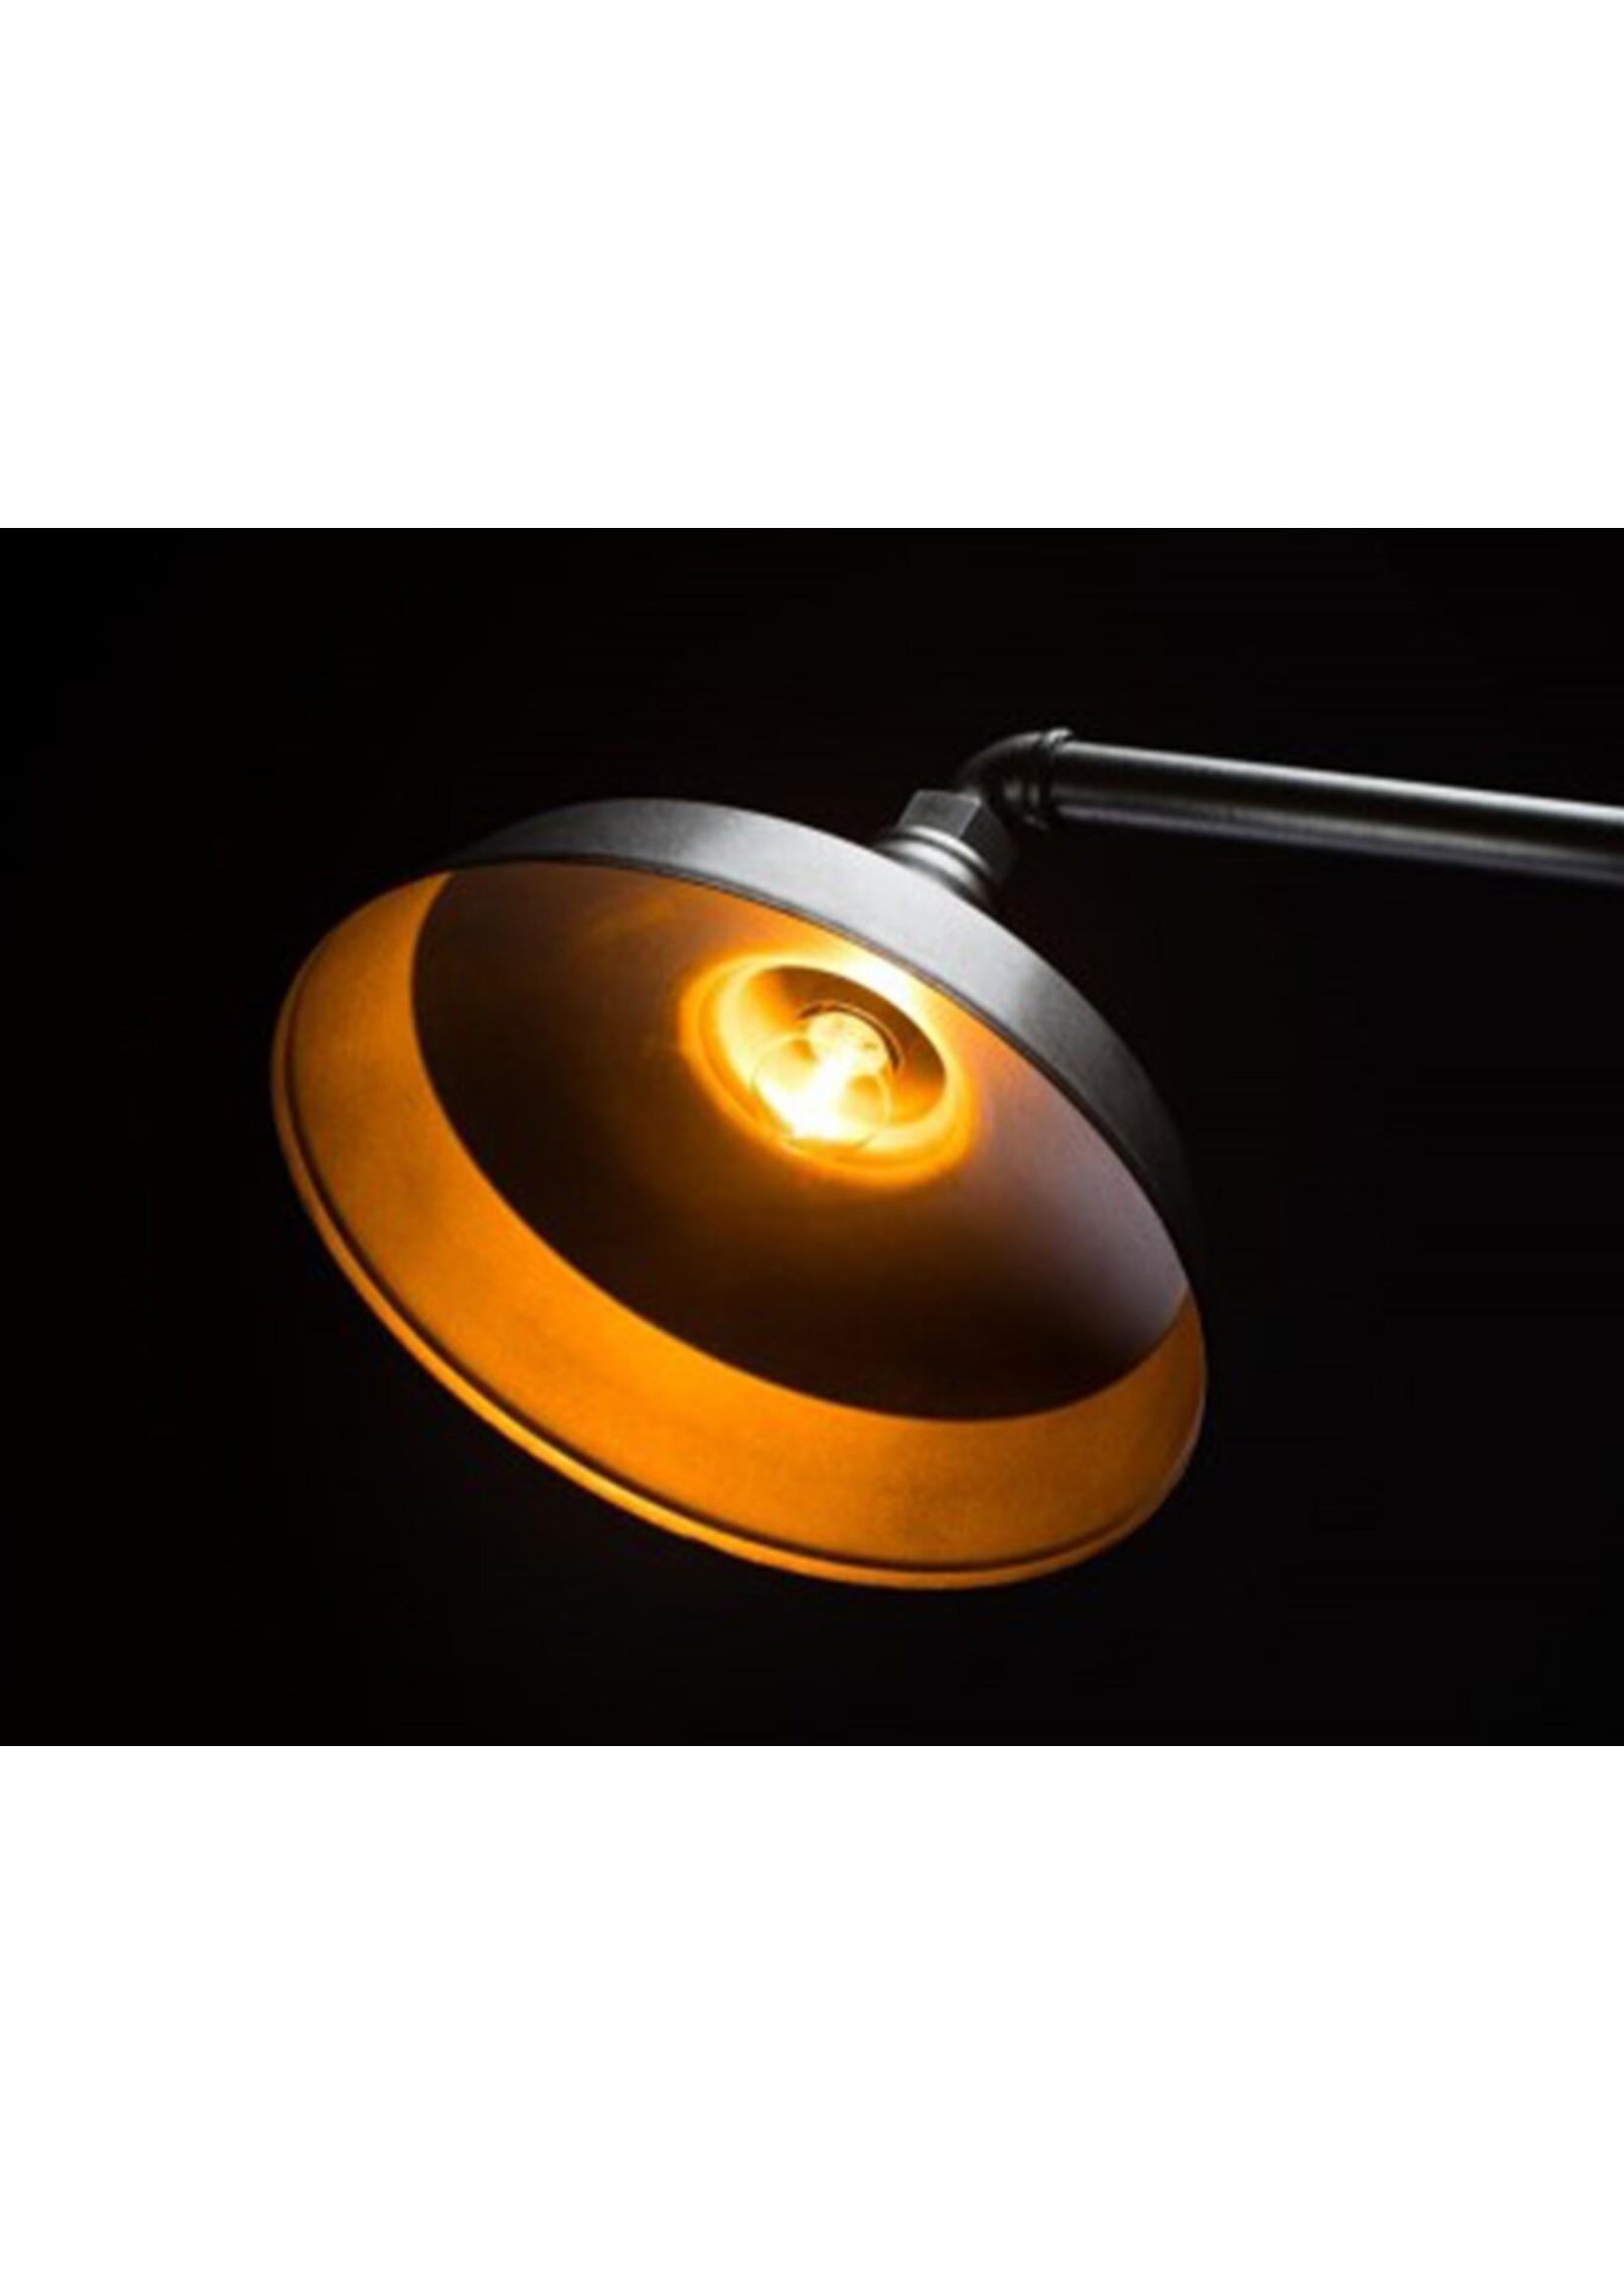 D & T dutch design D & T dutch design buitenlamp